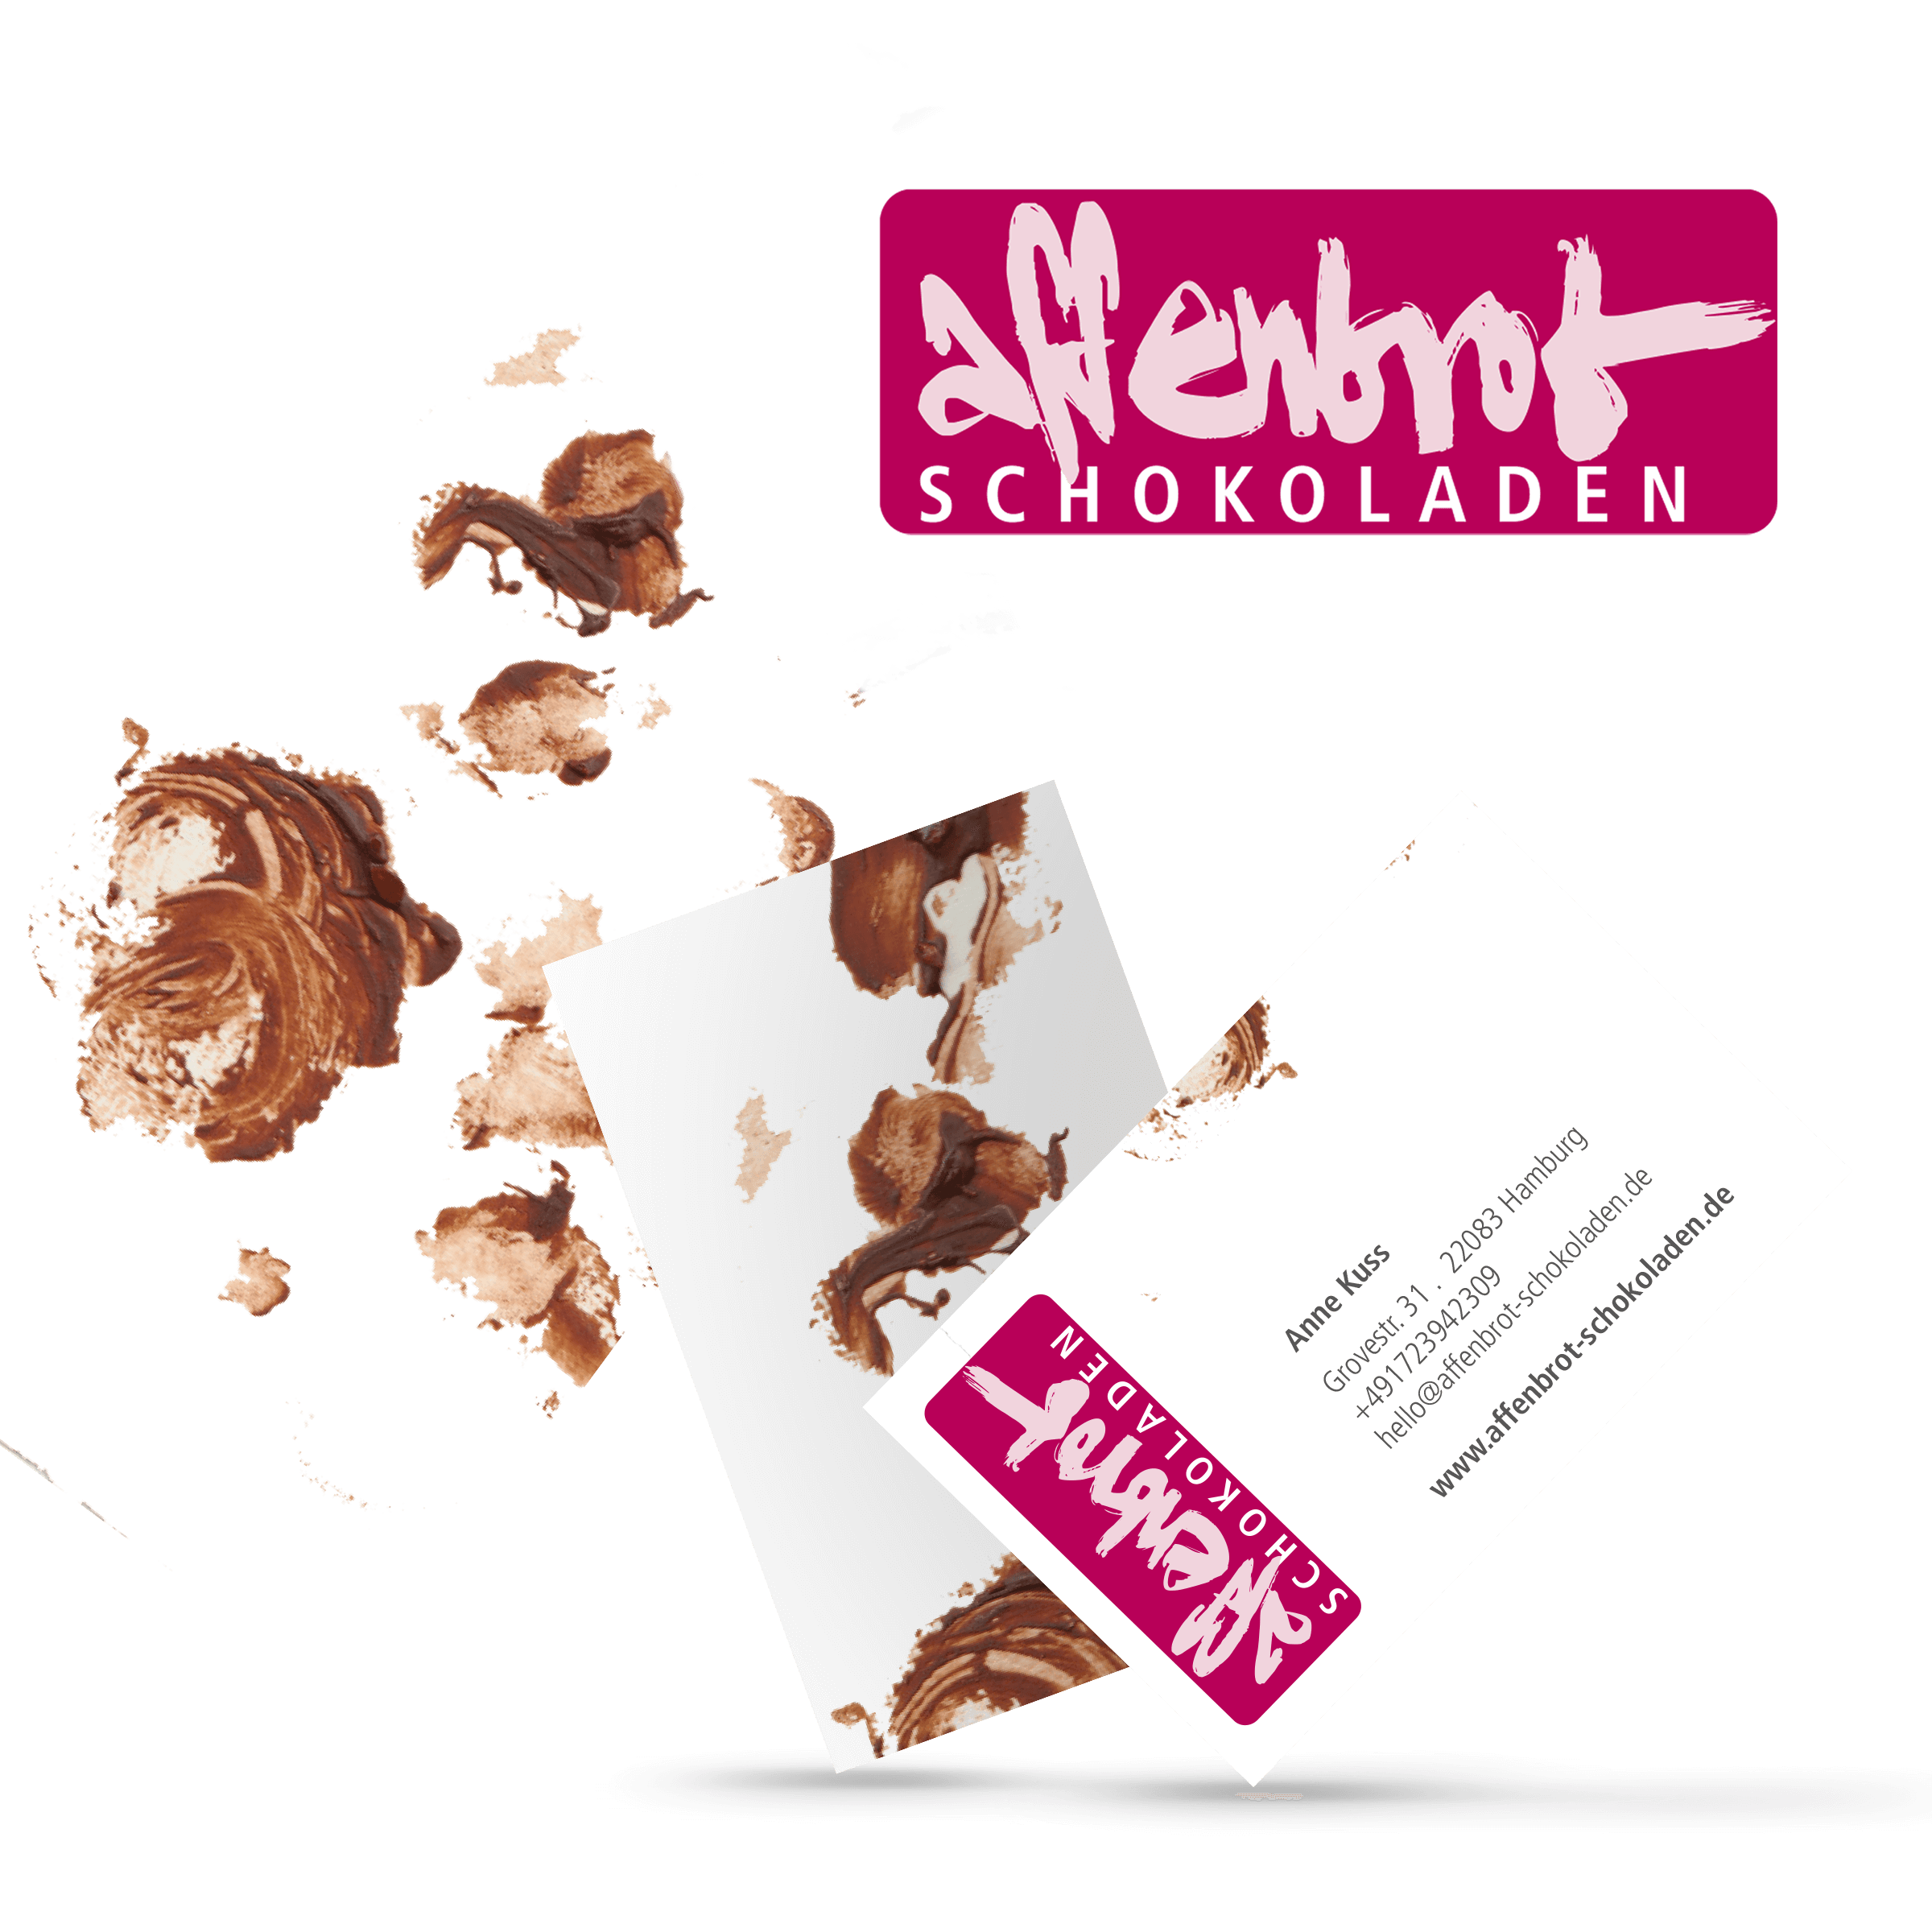 affenbrot-schokoladenmanufaktur-rosenthalpx